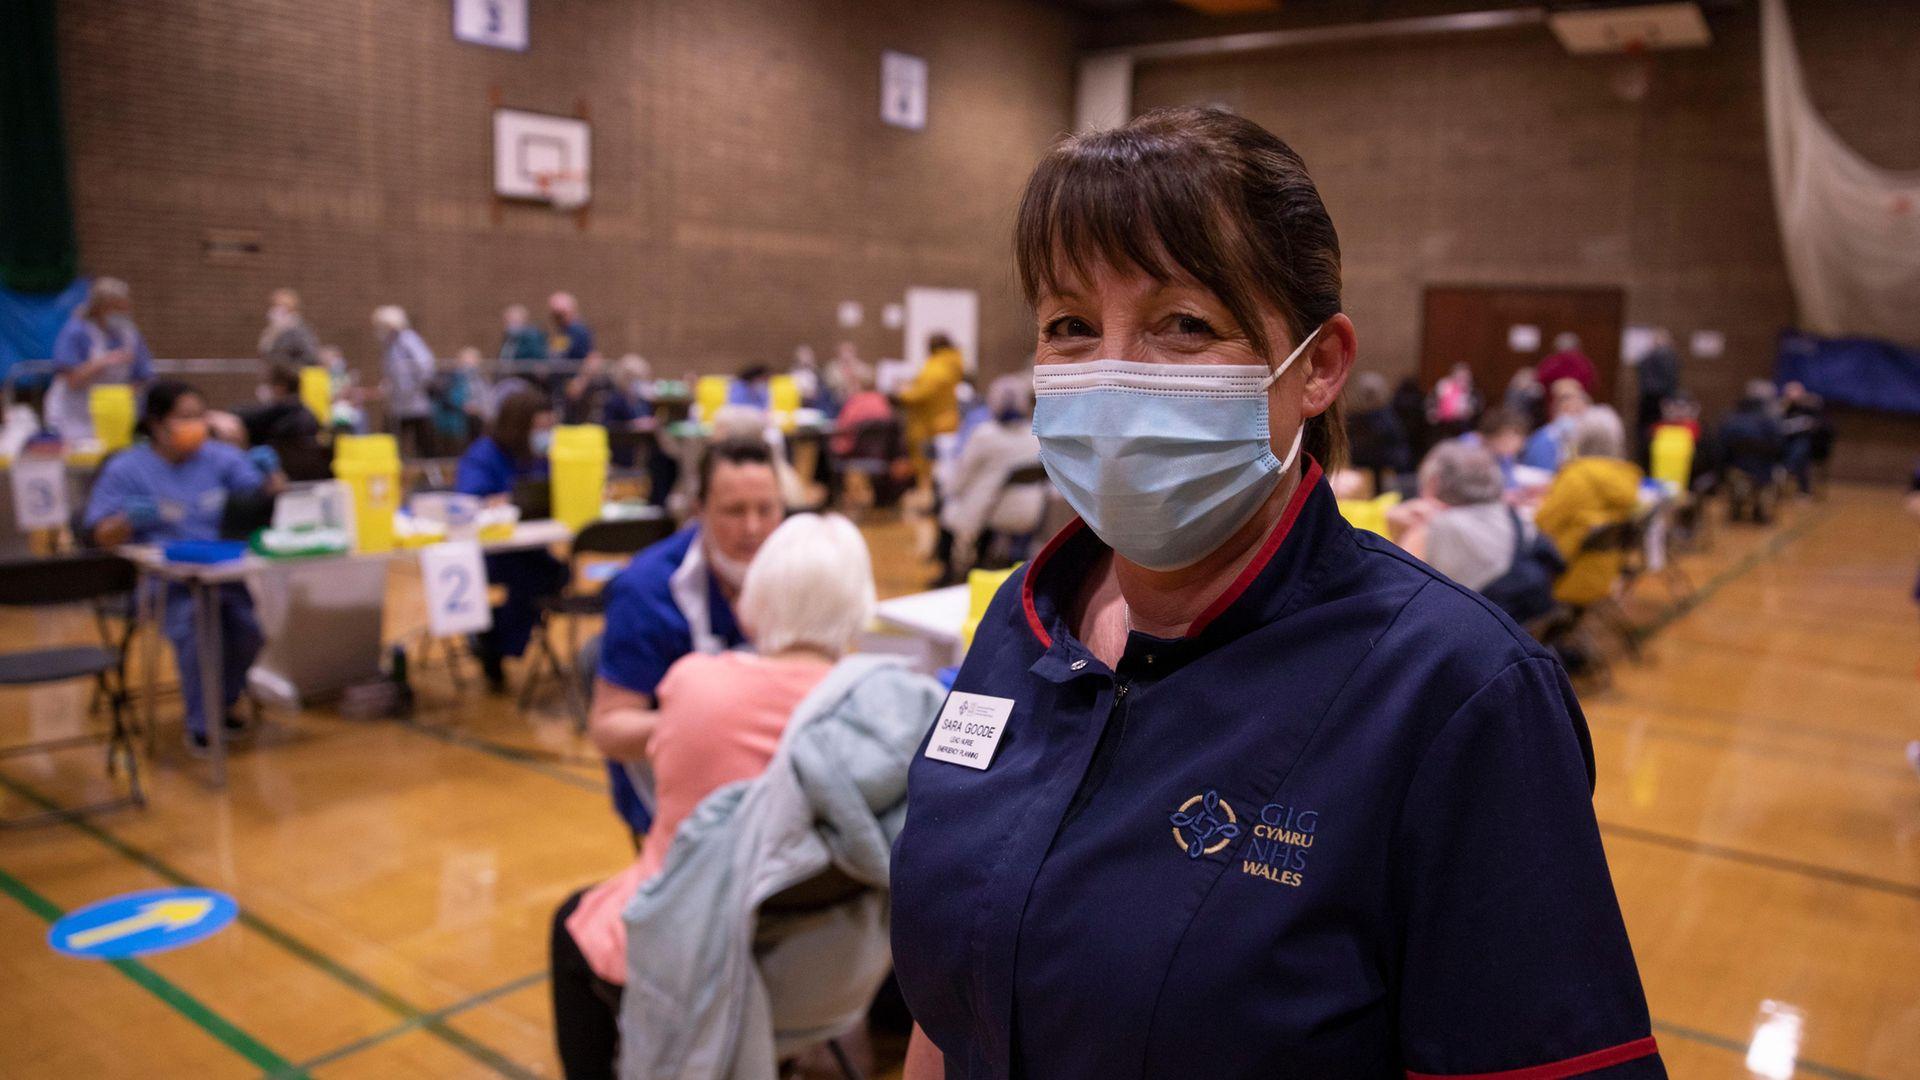 Sarah Jane Goode, a nurse at Aneurin Bevan University Health Board Trust, at a vaccine hub in Newbridge, Wales - Credit: Getty Images